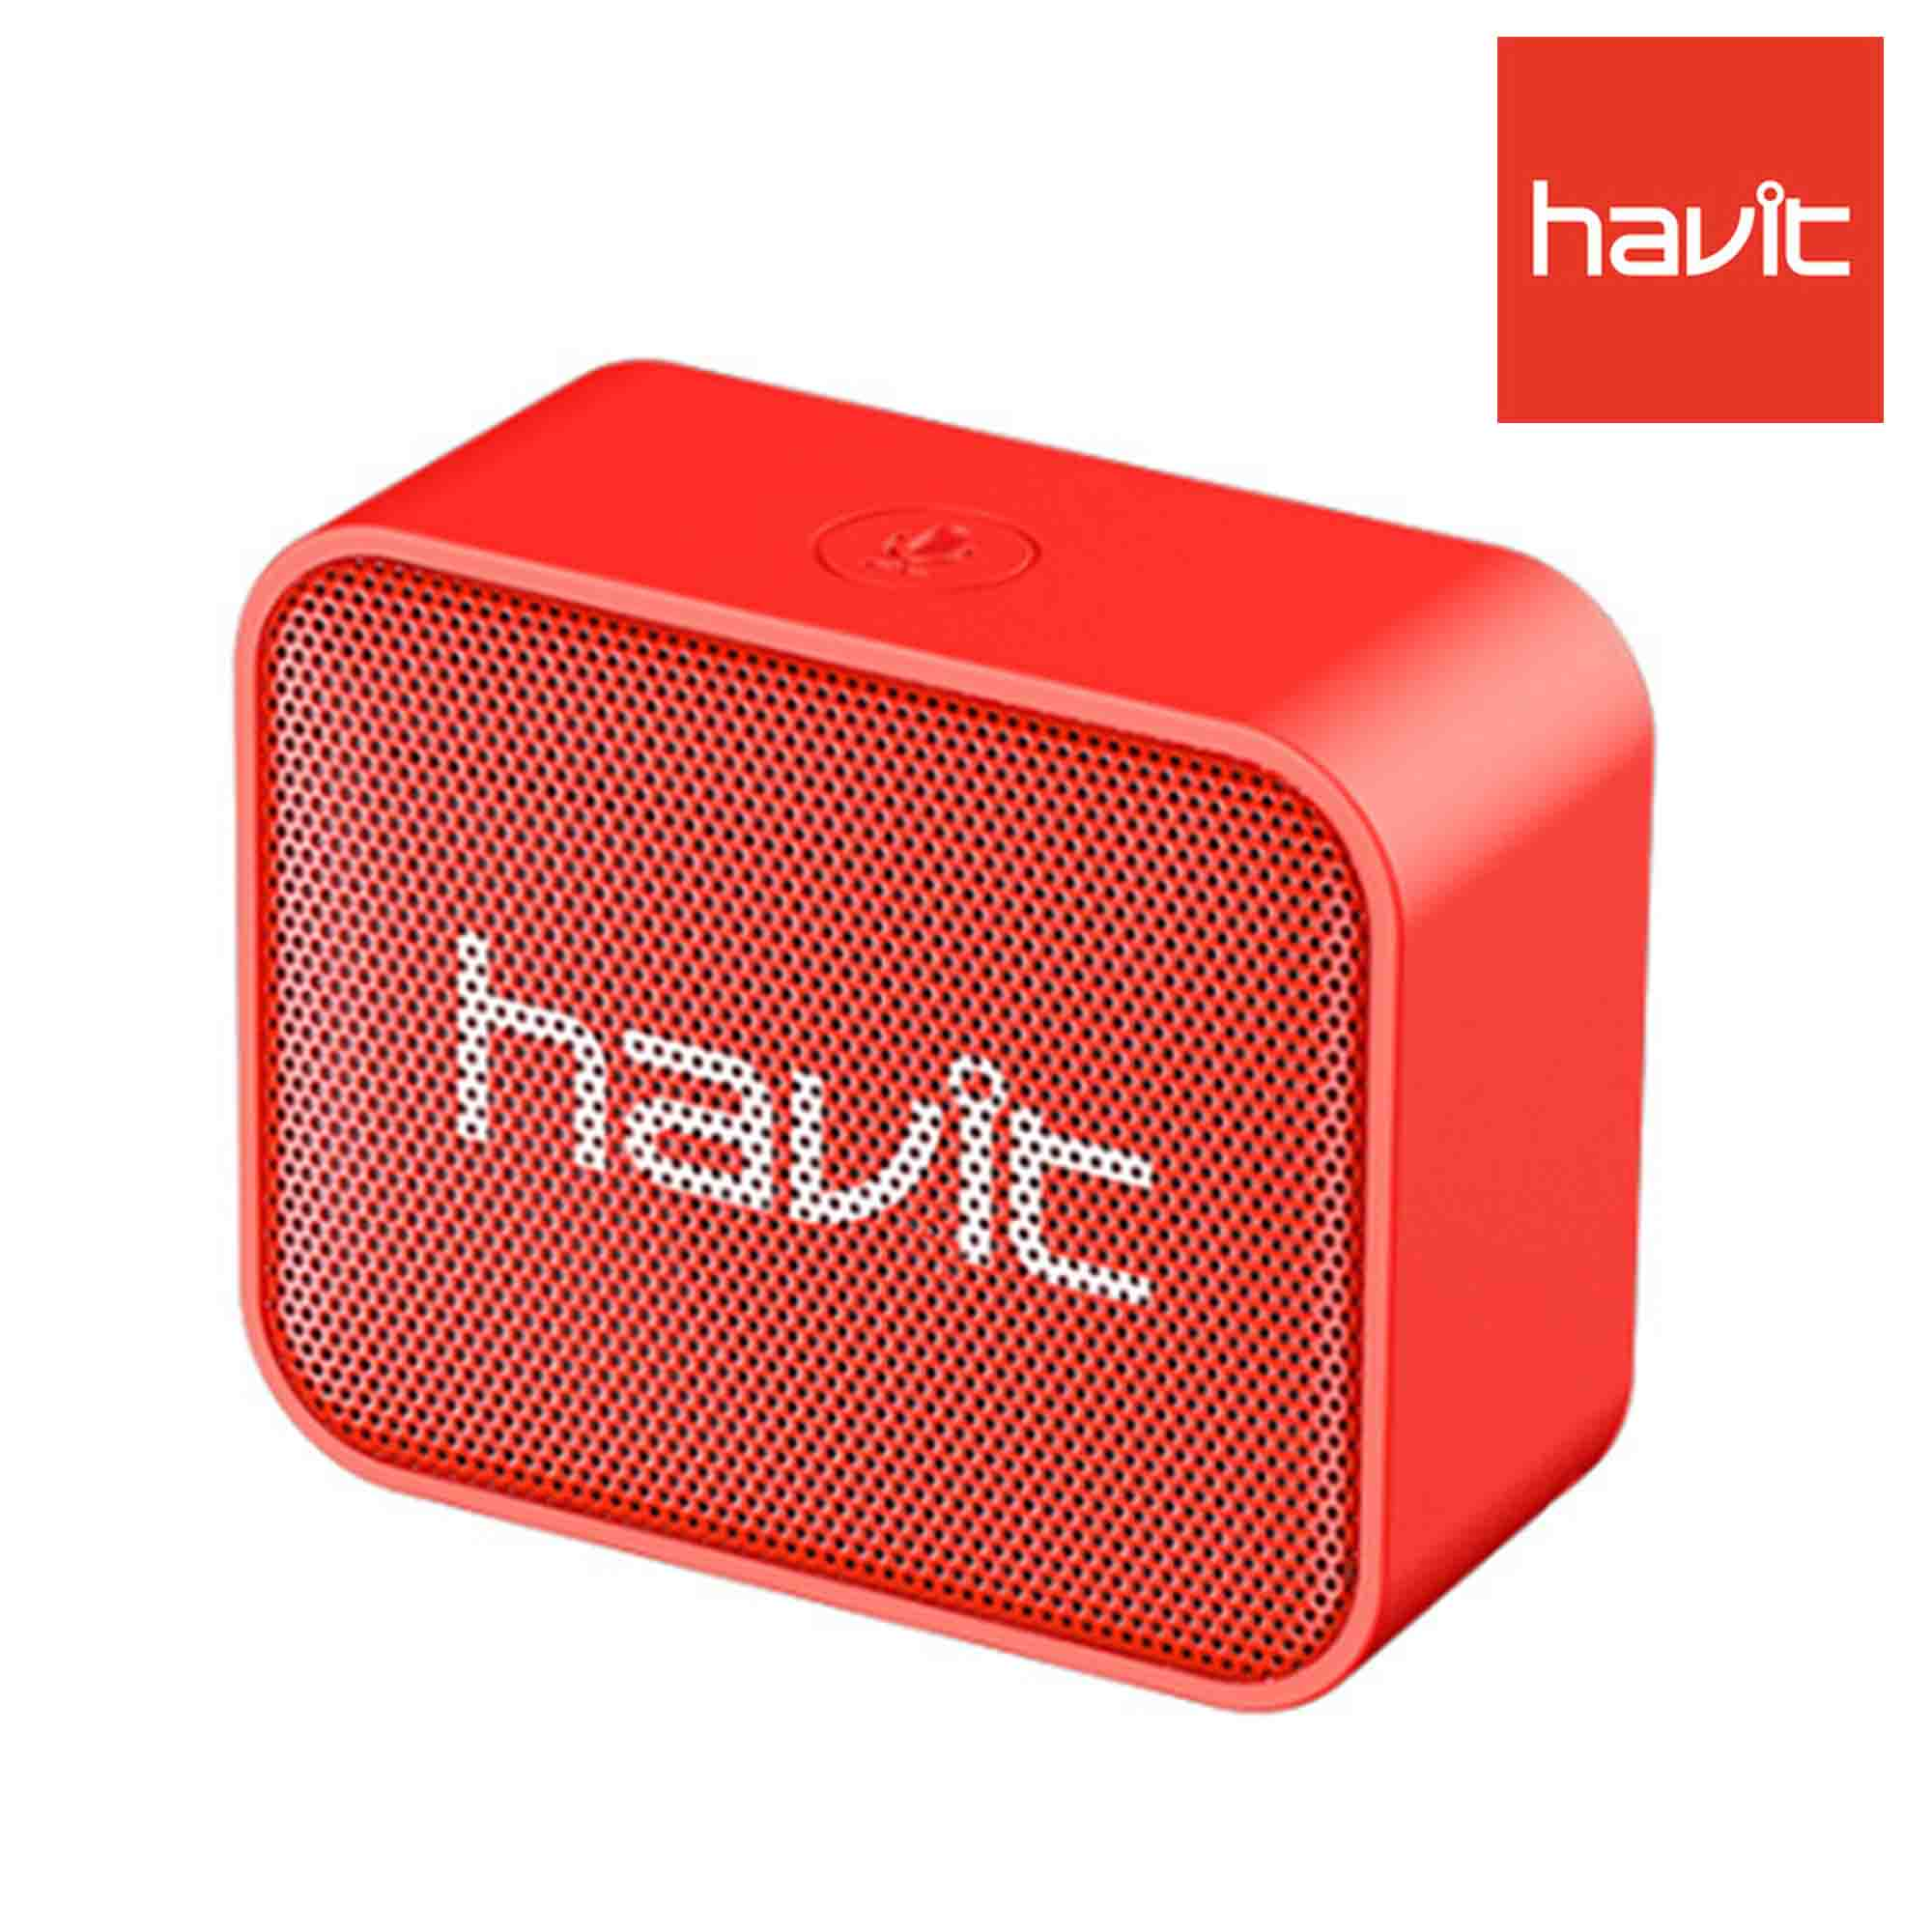 Havit MX702 Portable Bluetooth Speaker-Red